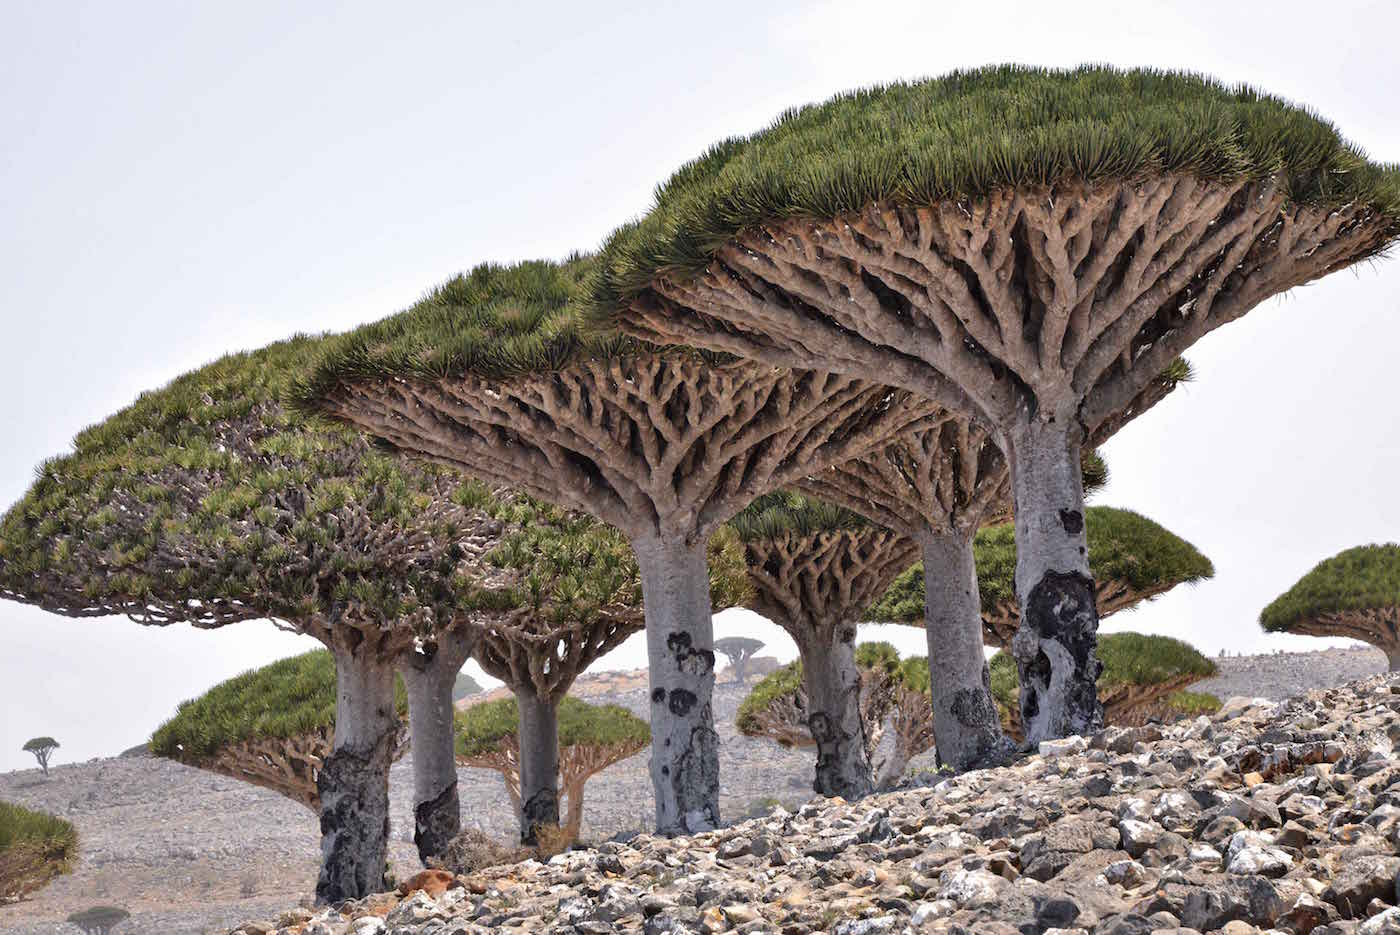 Dragon Blood Trees of Socotra, Yemen